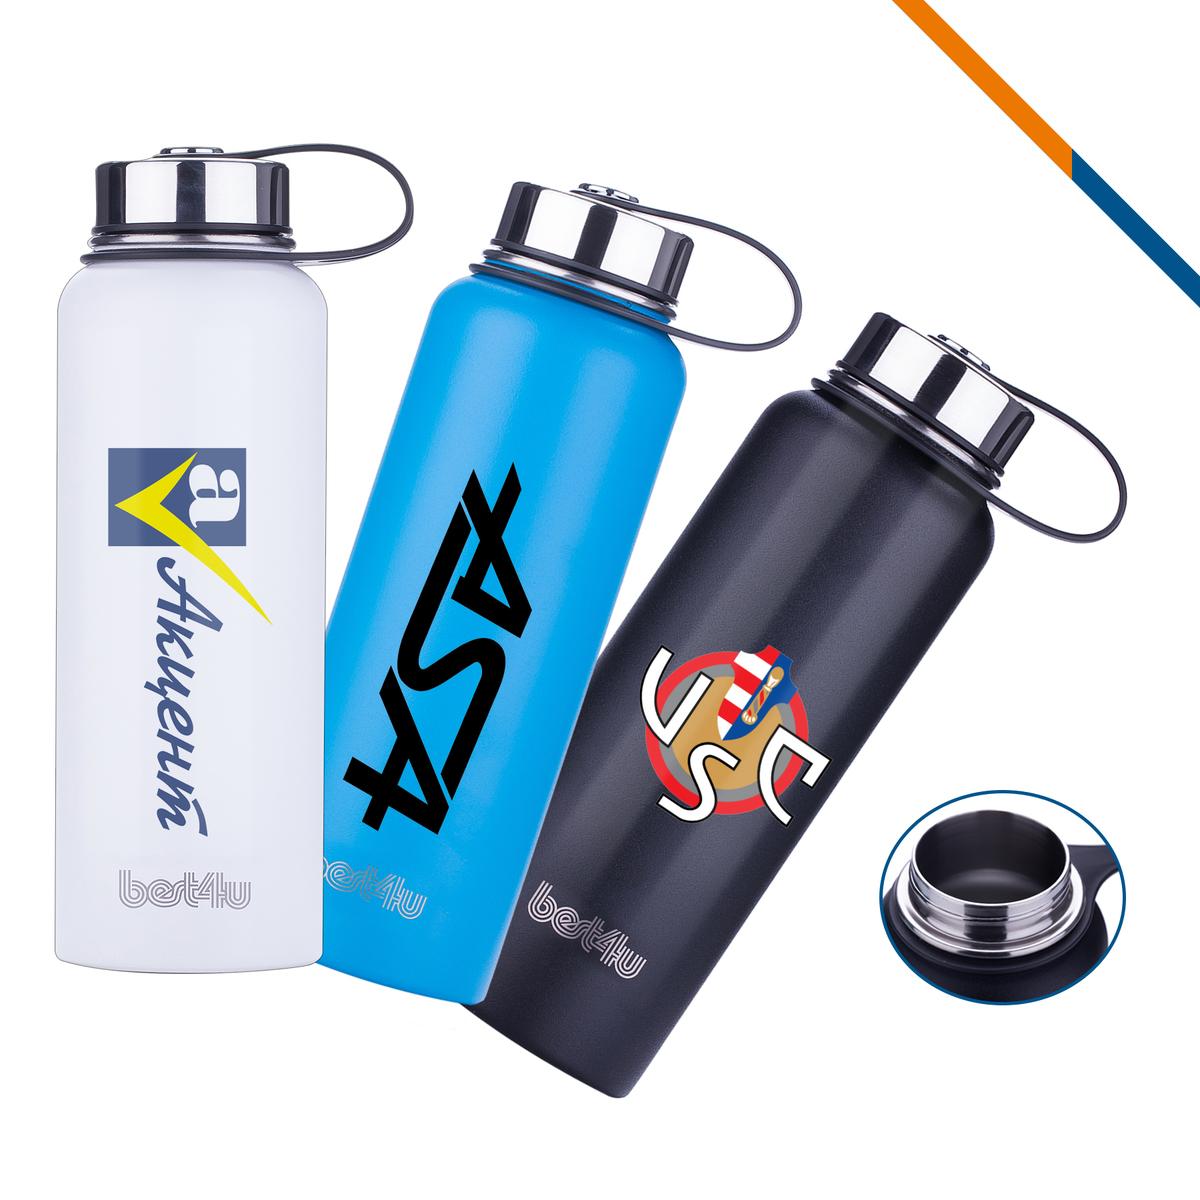 Hydro Stainless Steel Water Bottles